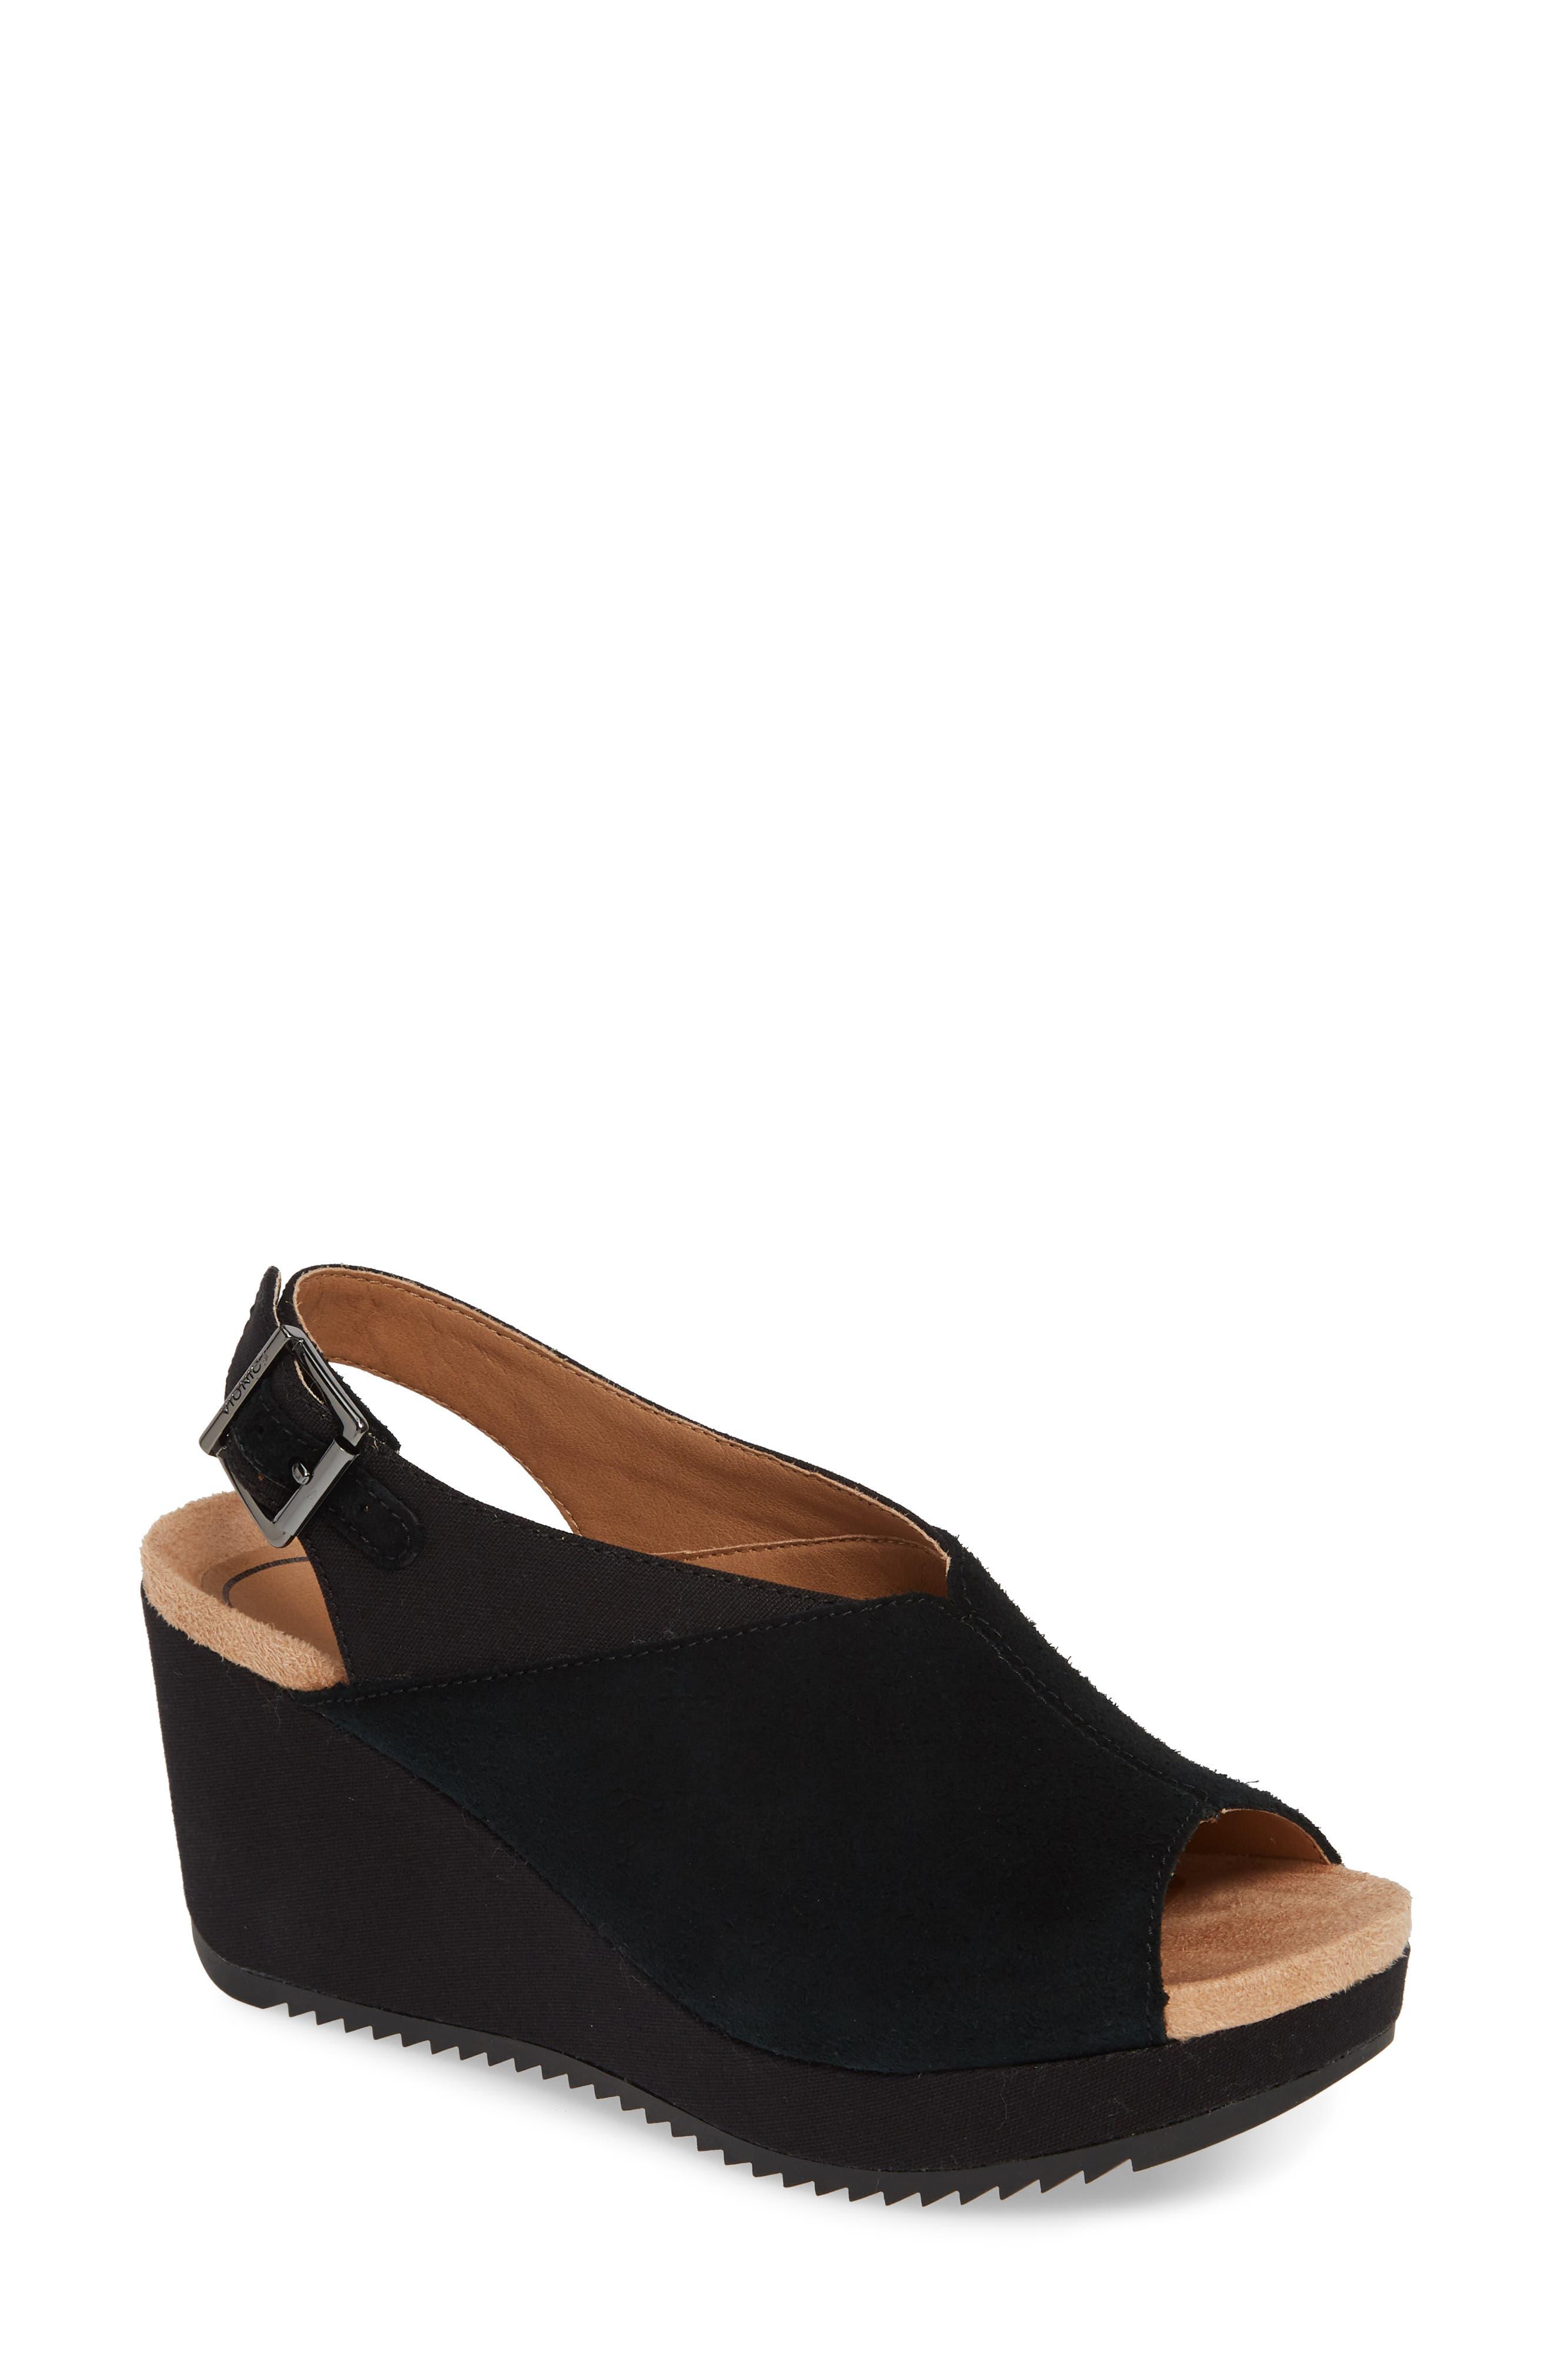 VIONIC Trixie Slingback Wedge, Main, color, BLACK